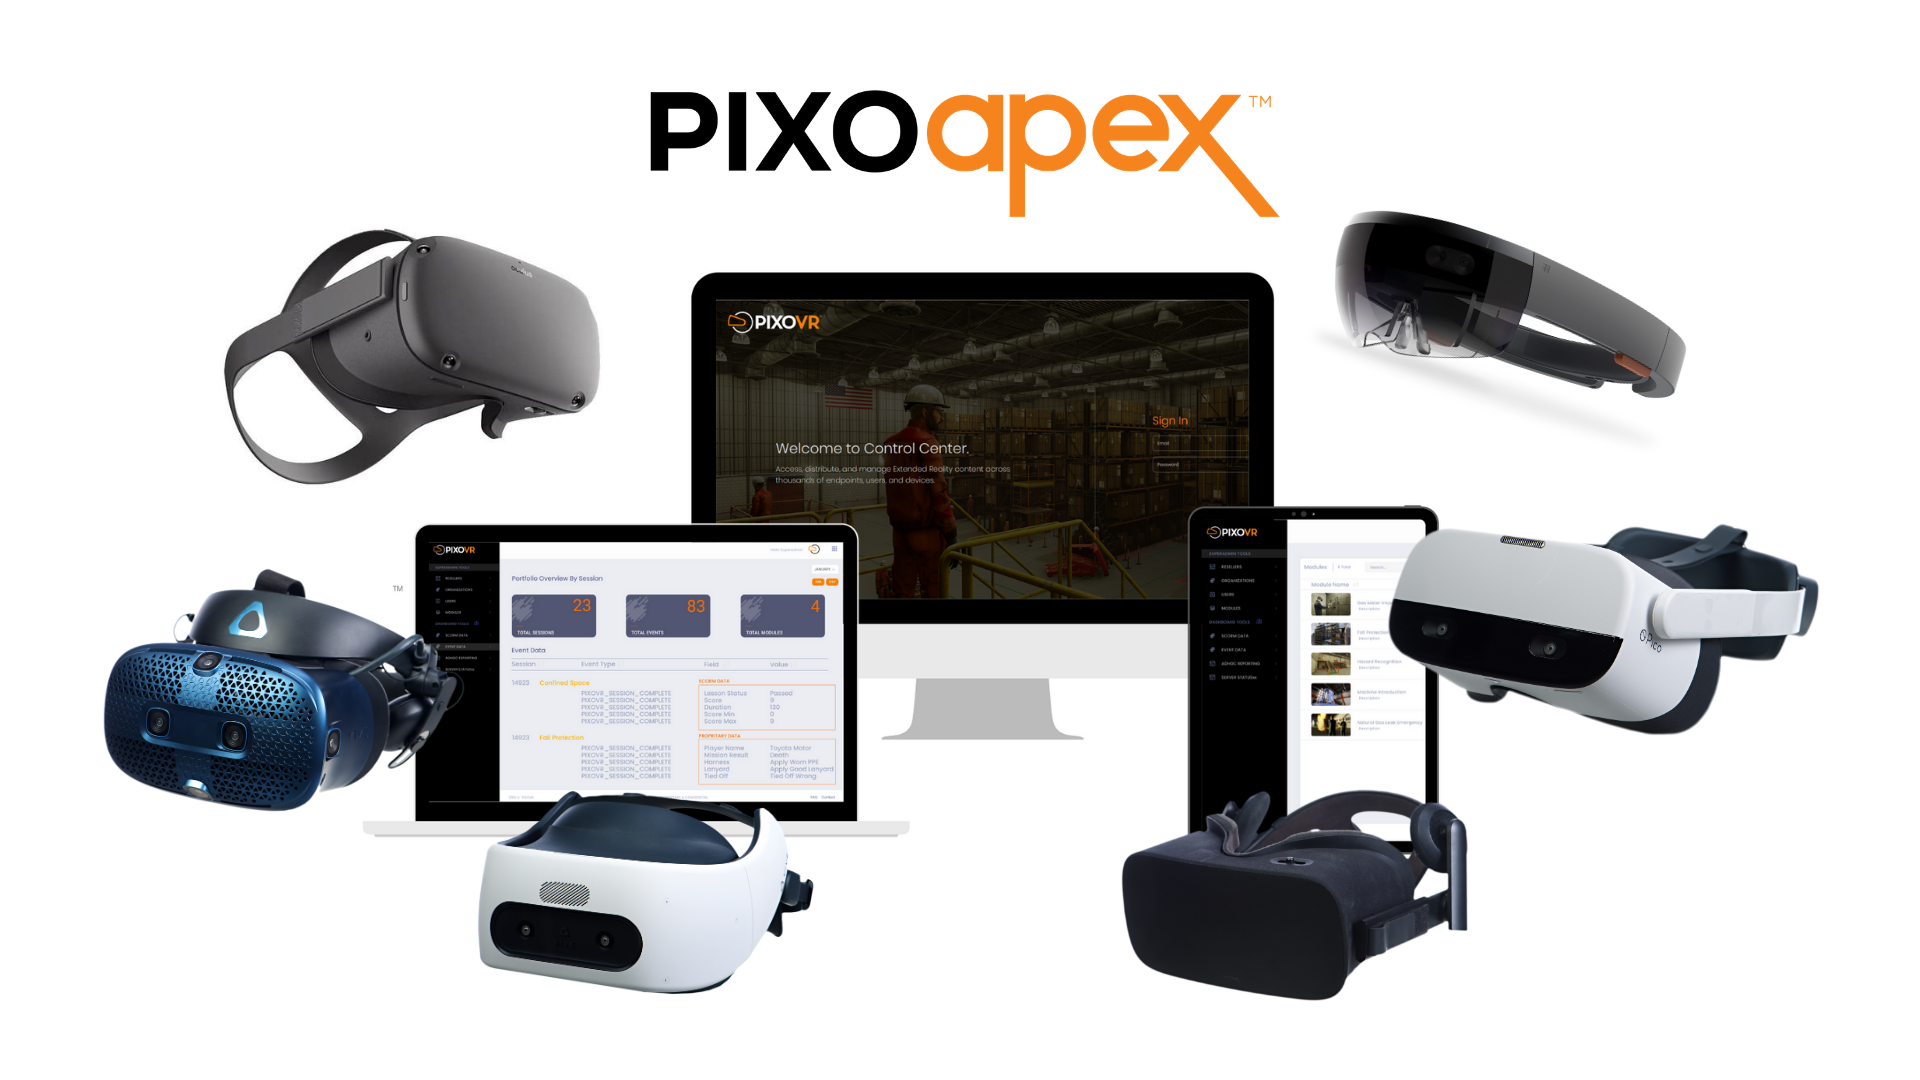 PIXO's new Apex system